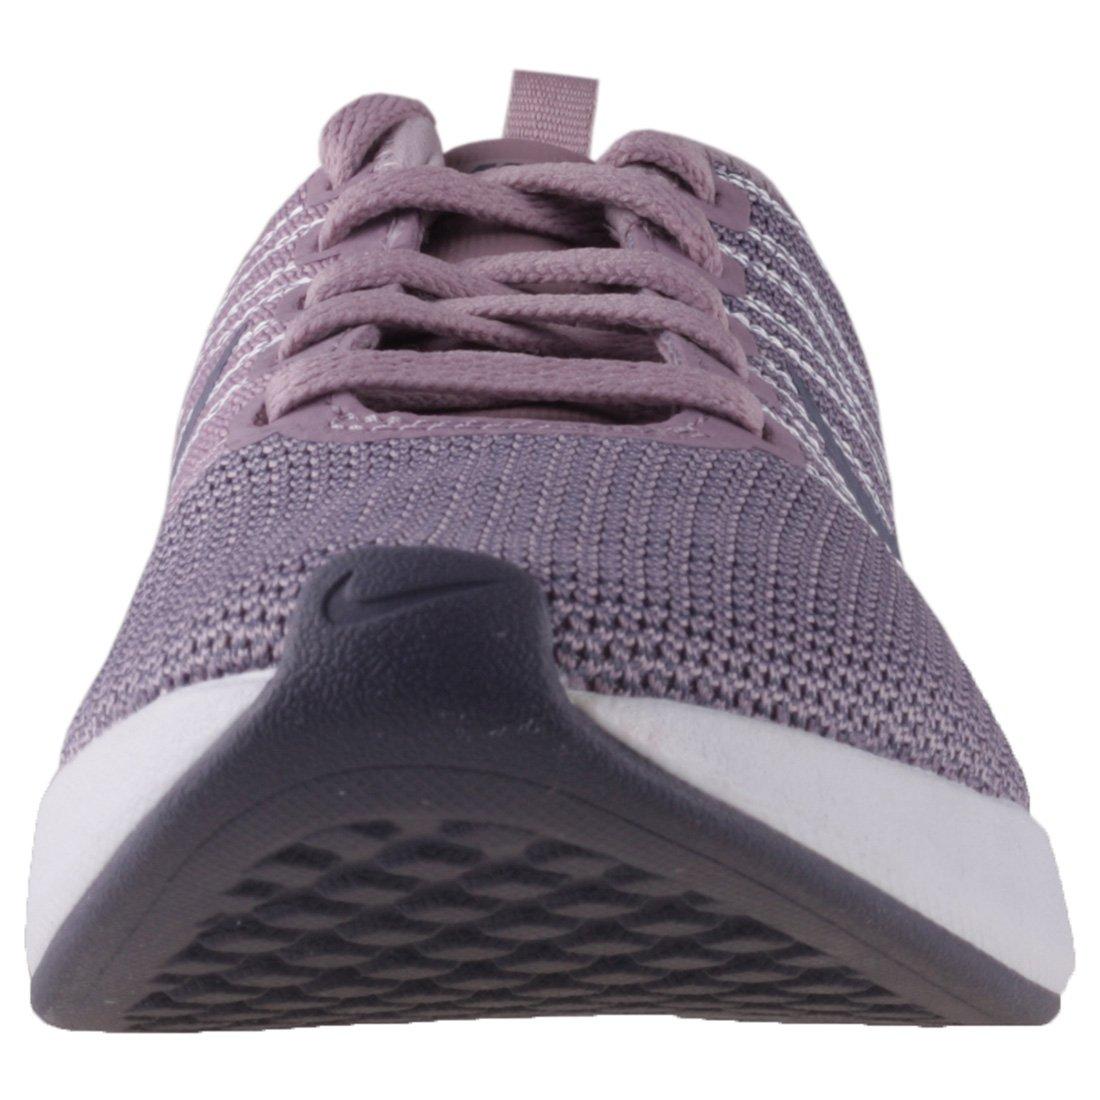 Nike Dualtone Racer Damen Turnschuhe 917682 Größe 38.5 38.5 38.5 EU Rosa (Rosa) da491b